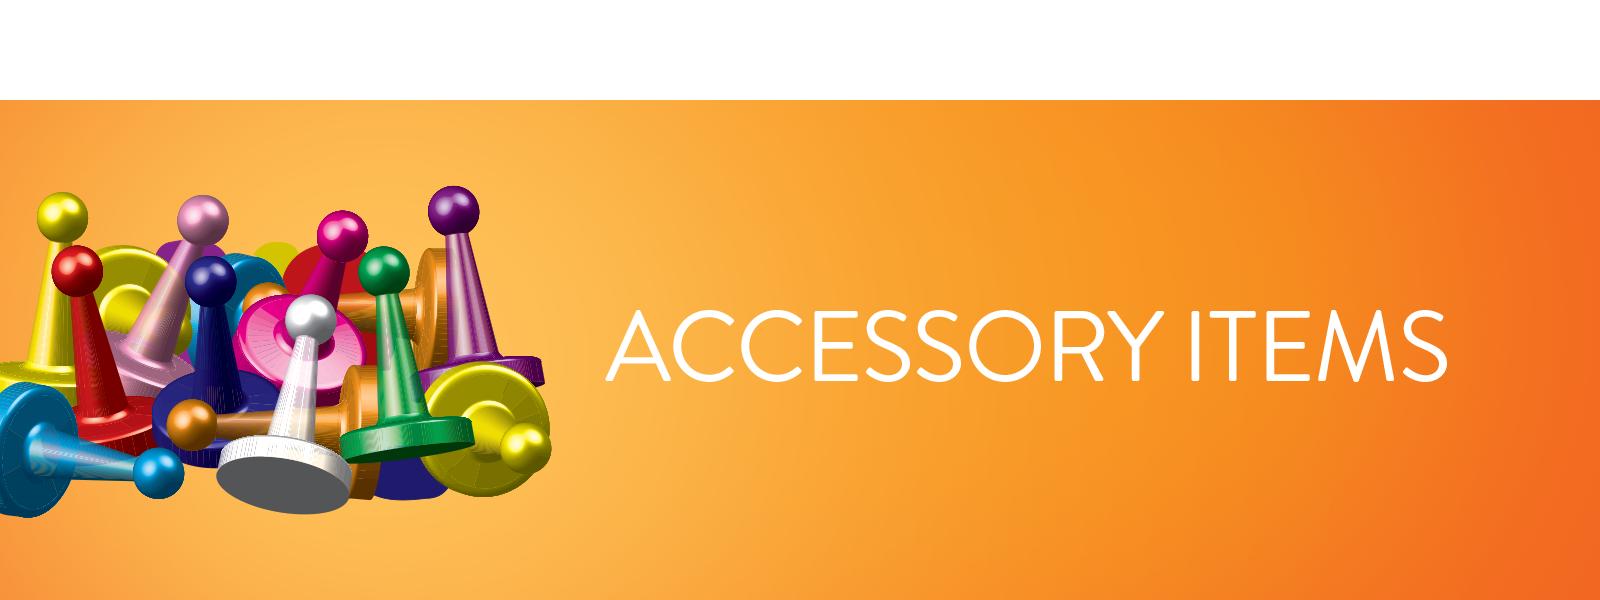 Accessory Items